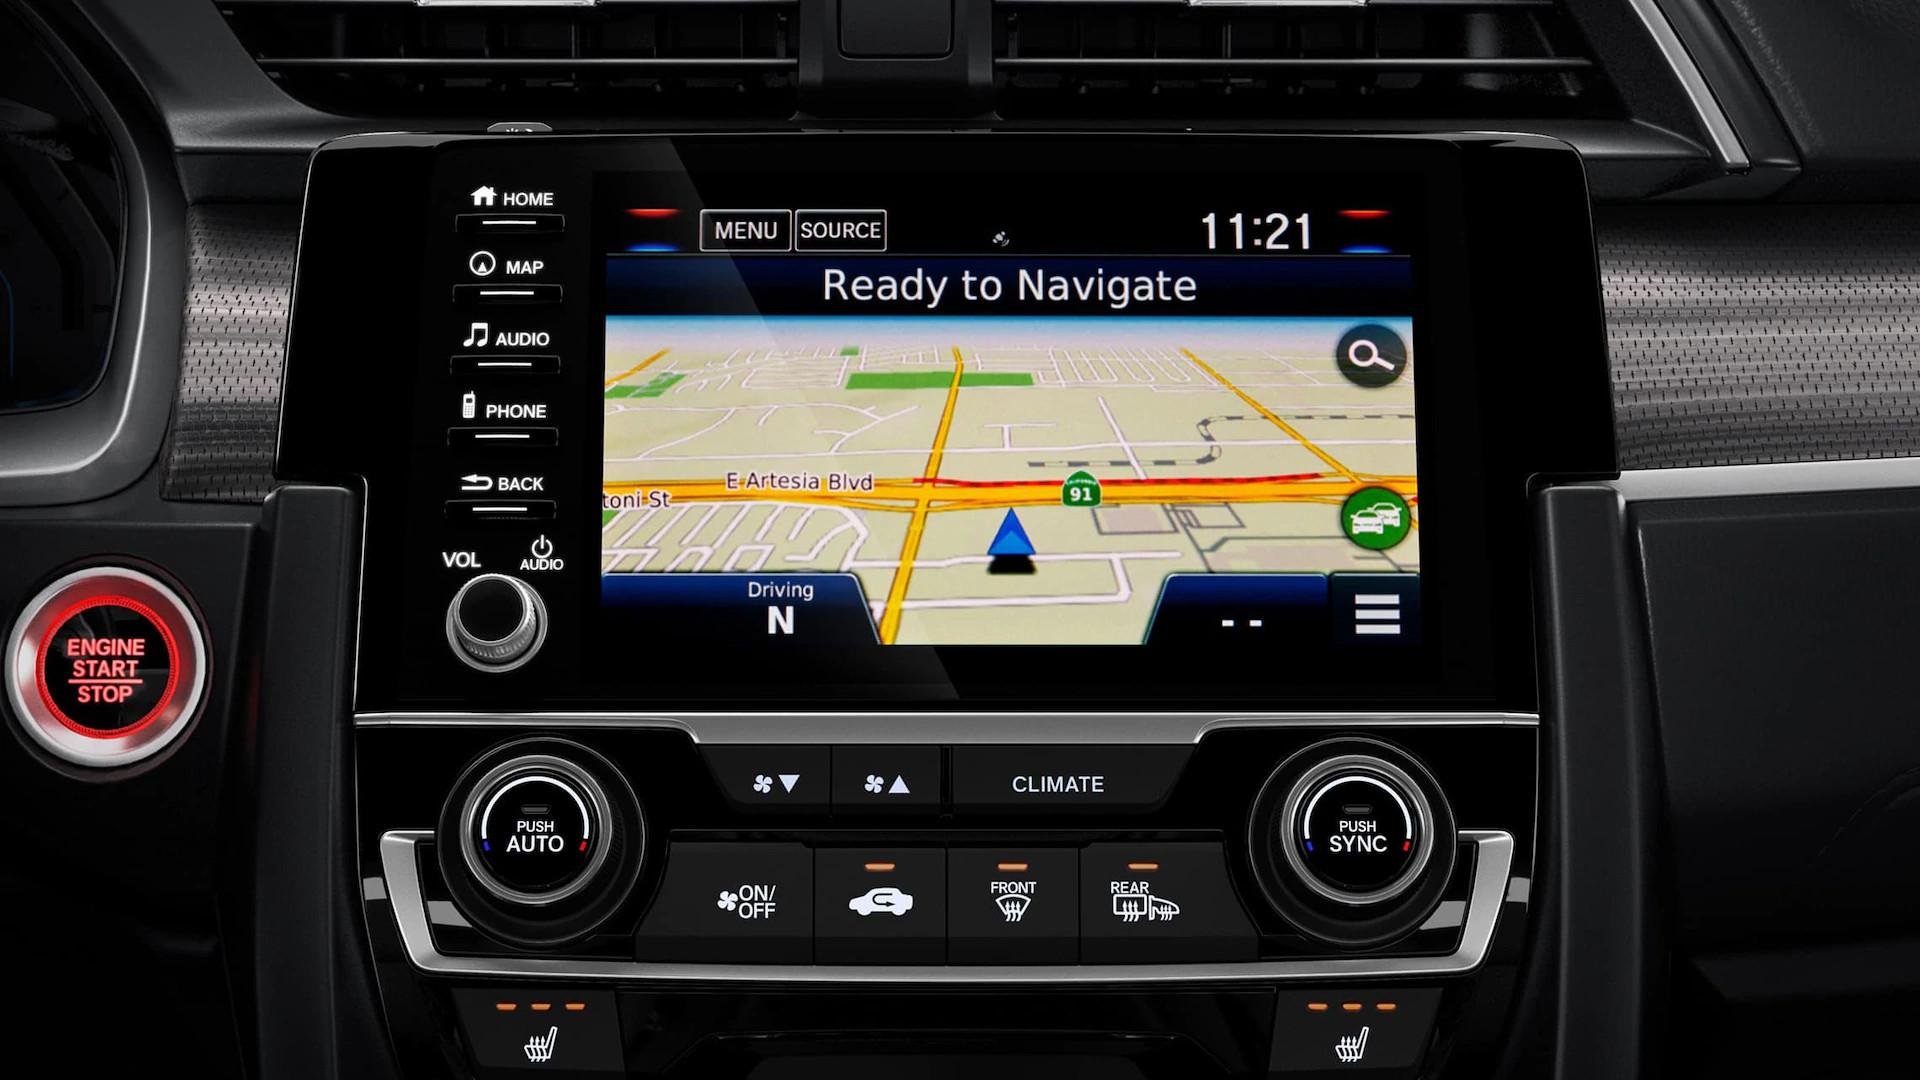 2020 Civic Navigation